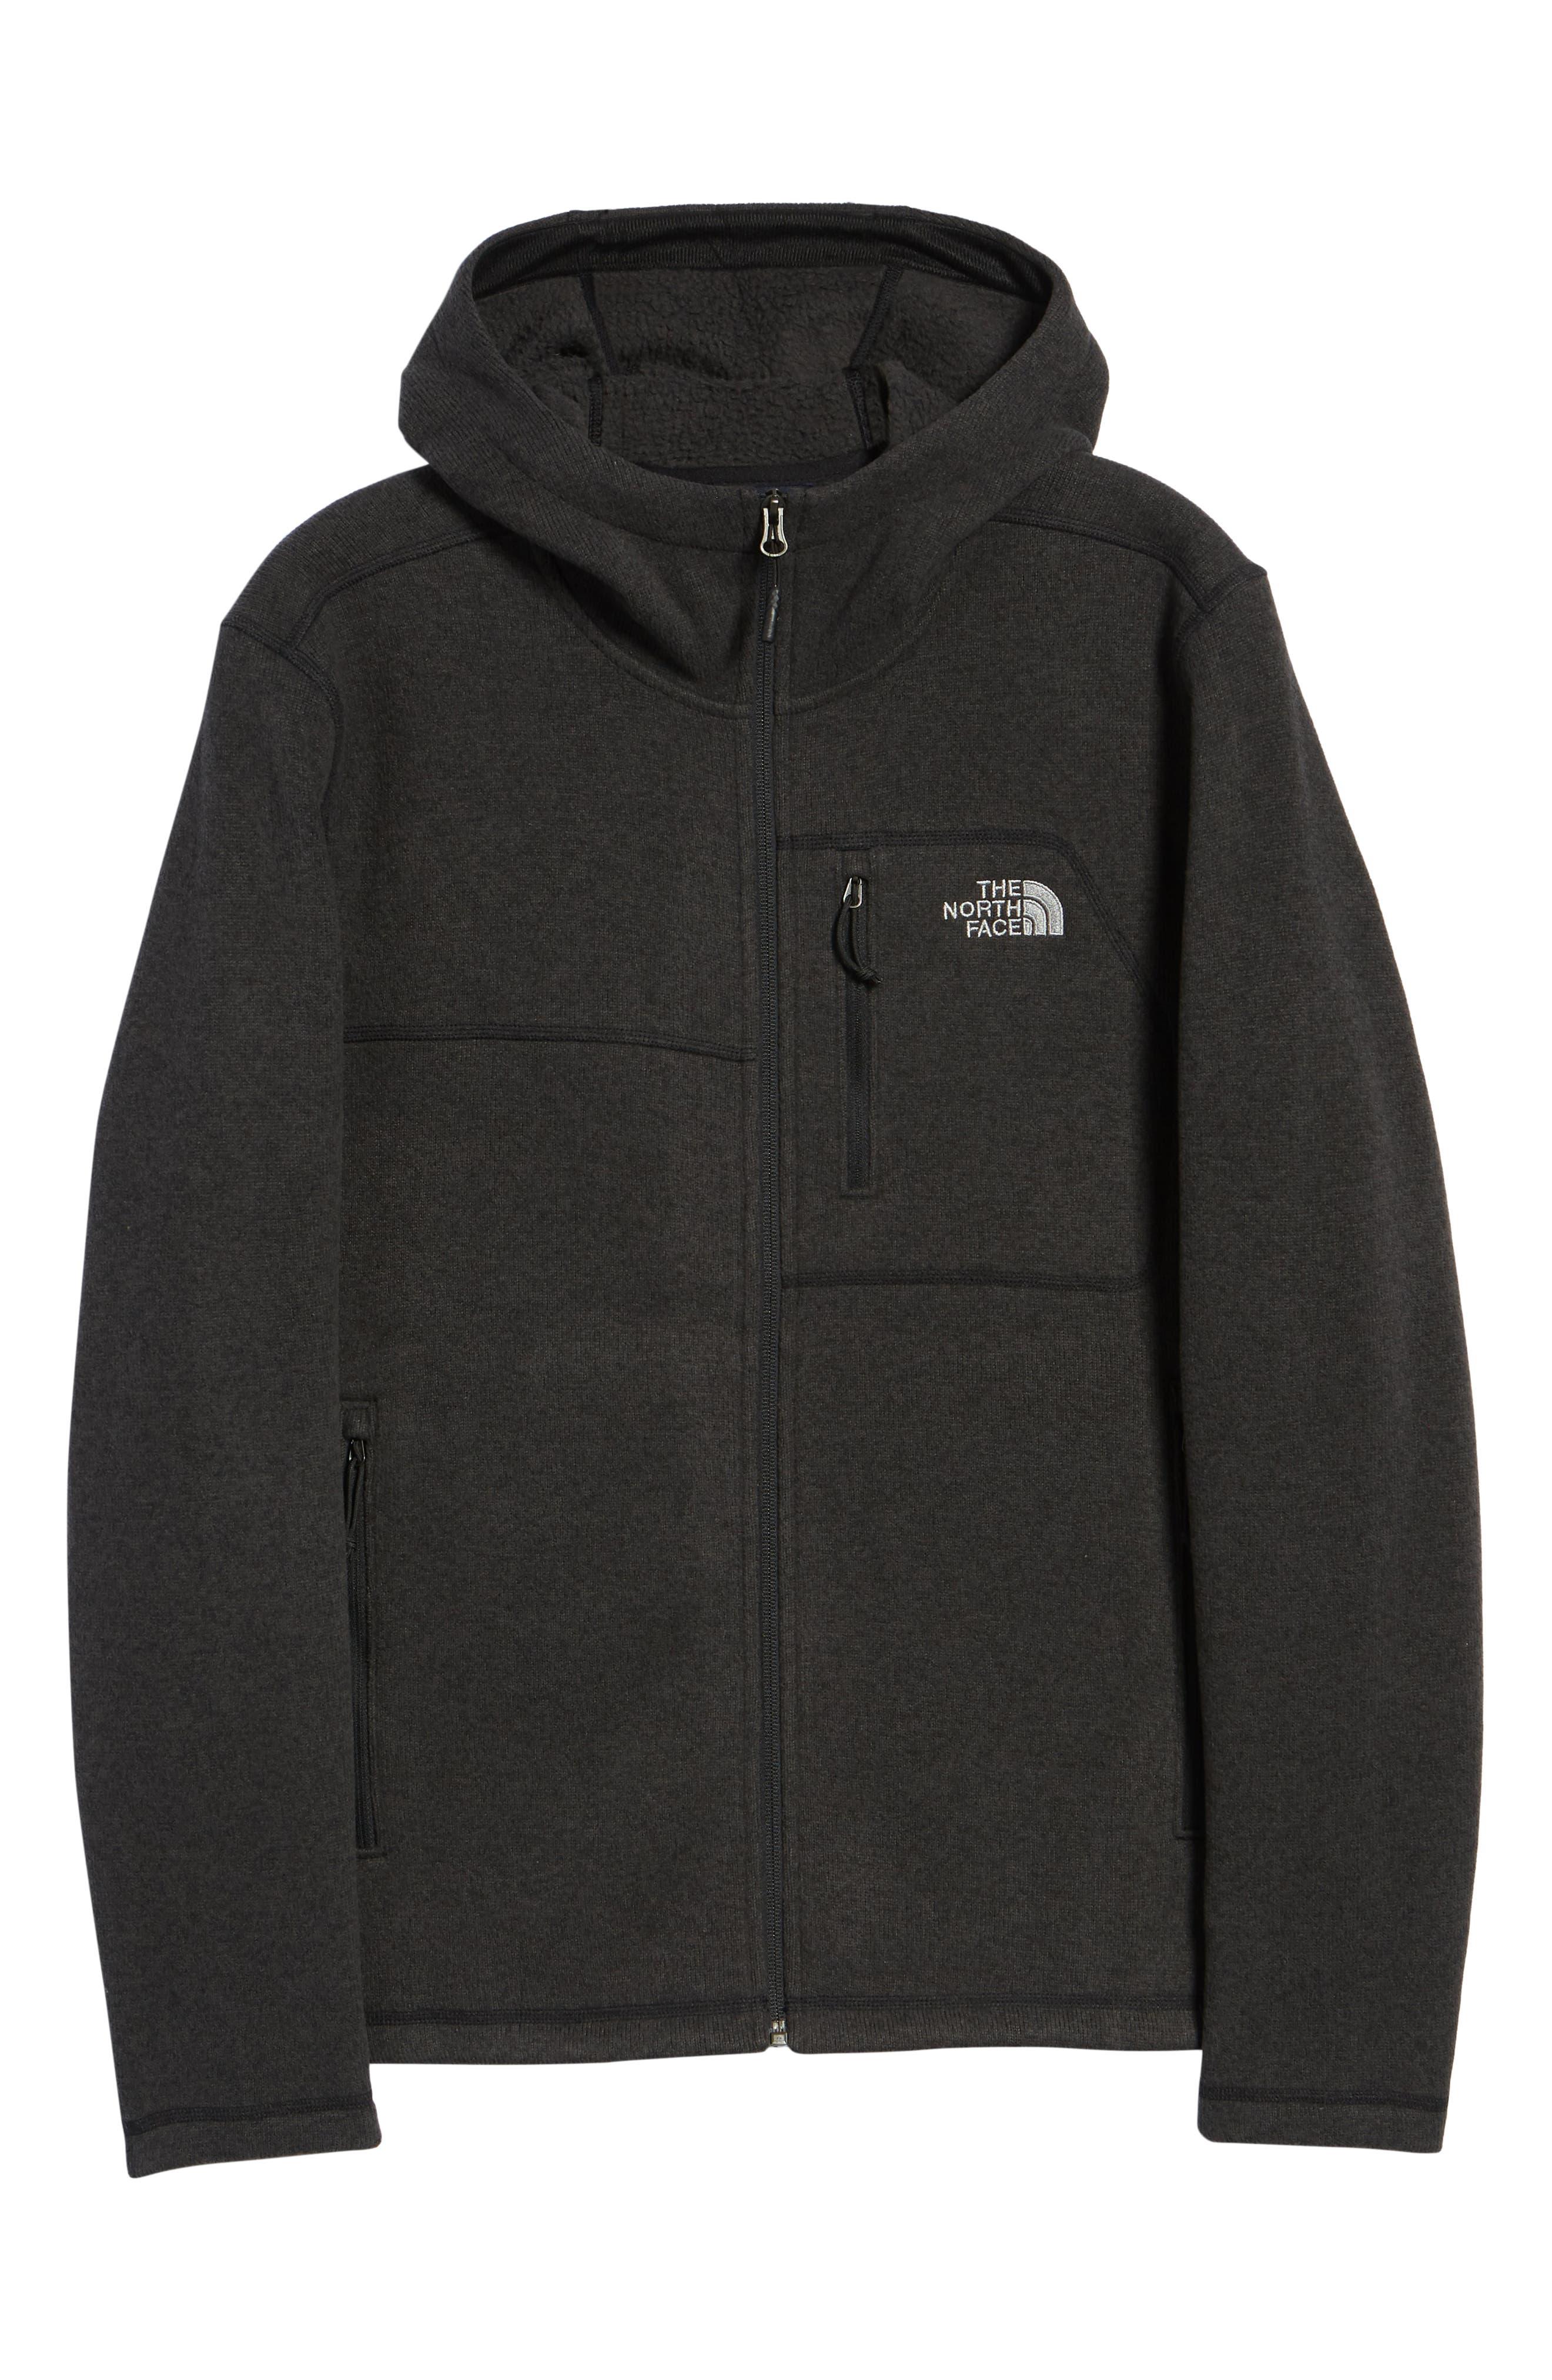 Gordon Lyons Relaxed Fit Sweater Fleece Hoodie,                             Alternate thumbnail 7, color,                             TNF BLACK HEATHER